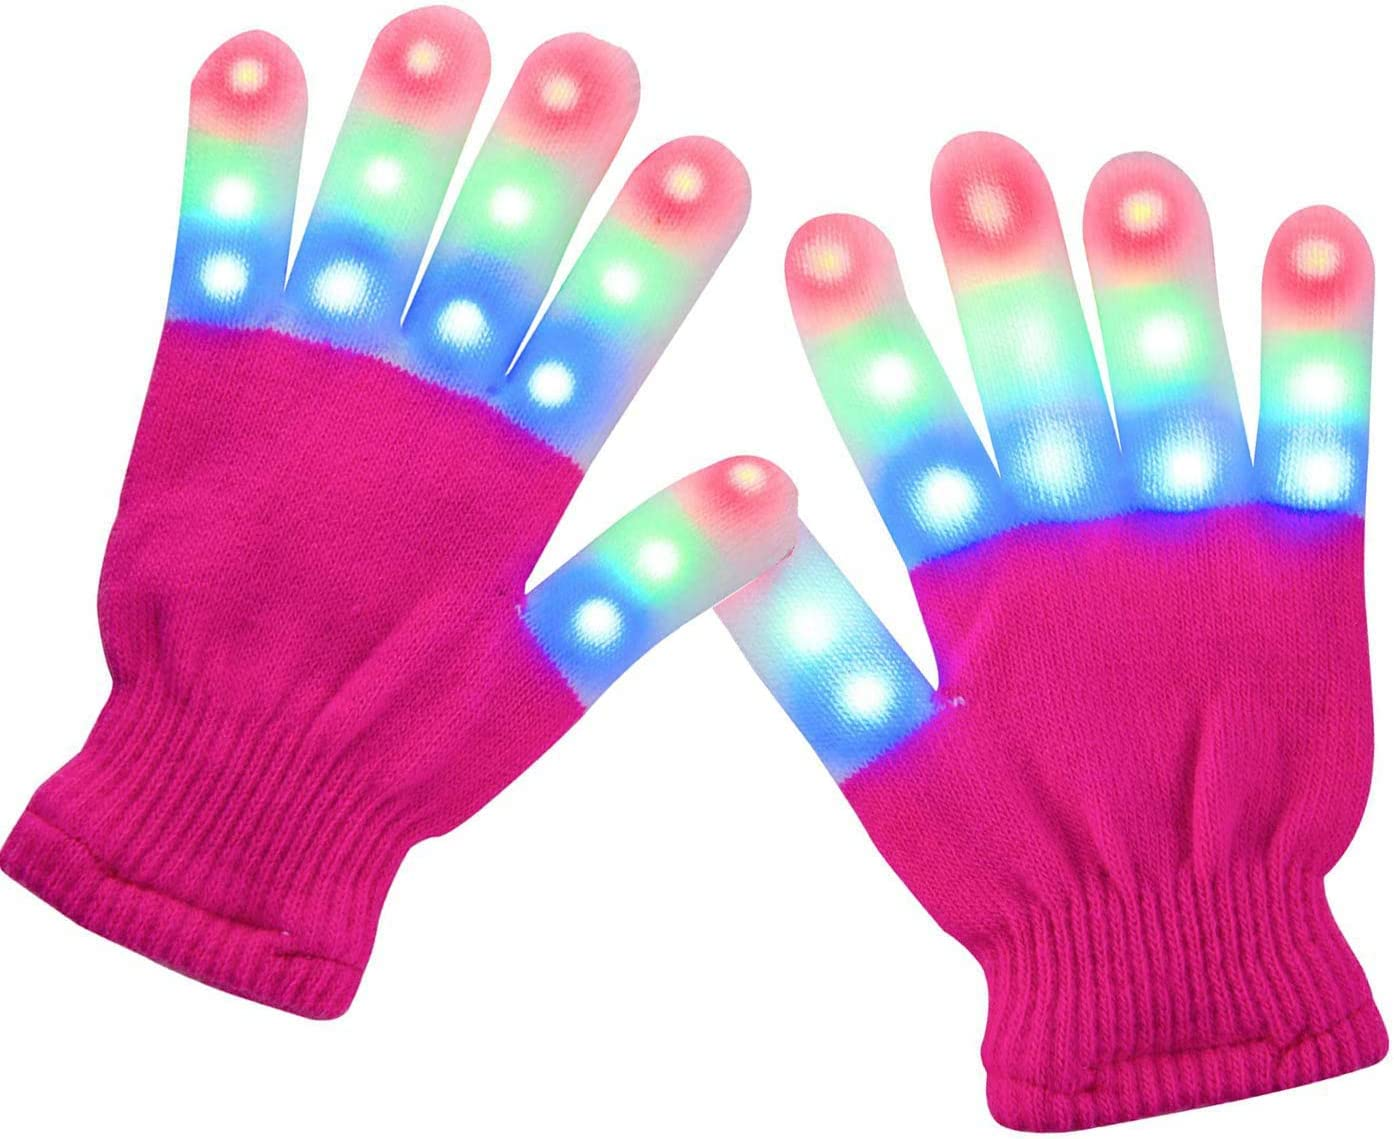 Batlofty LED Gloves for Kids, LED Light Gloves Light Up Finger Lights Gloves 3 Colors 6 Light Modes Colorful LED Rave Gloves for Kids with Extra Batteries (Children+Pink)